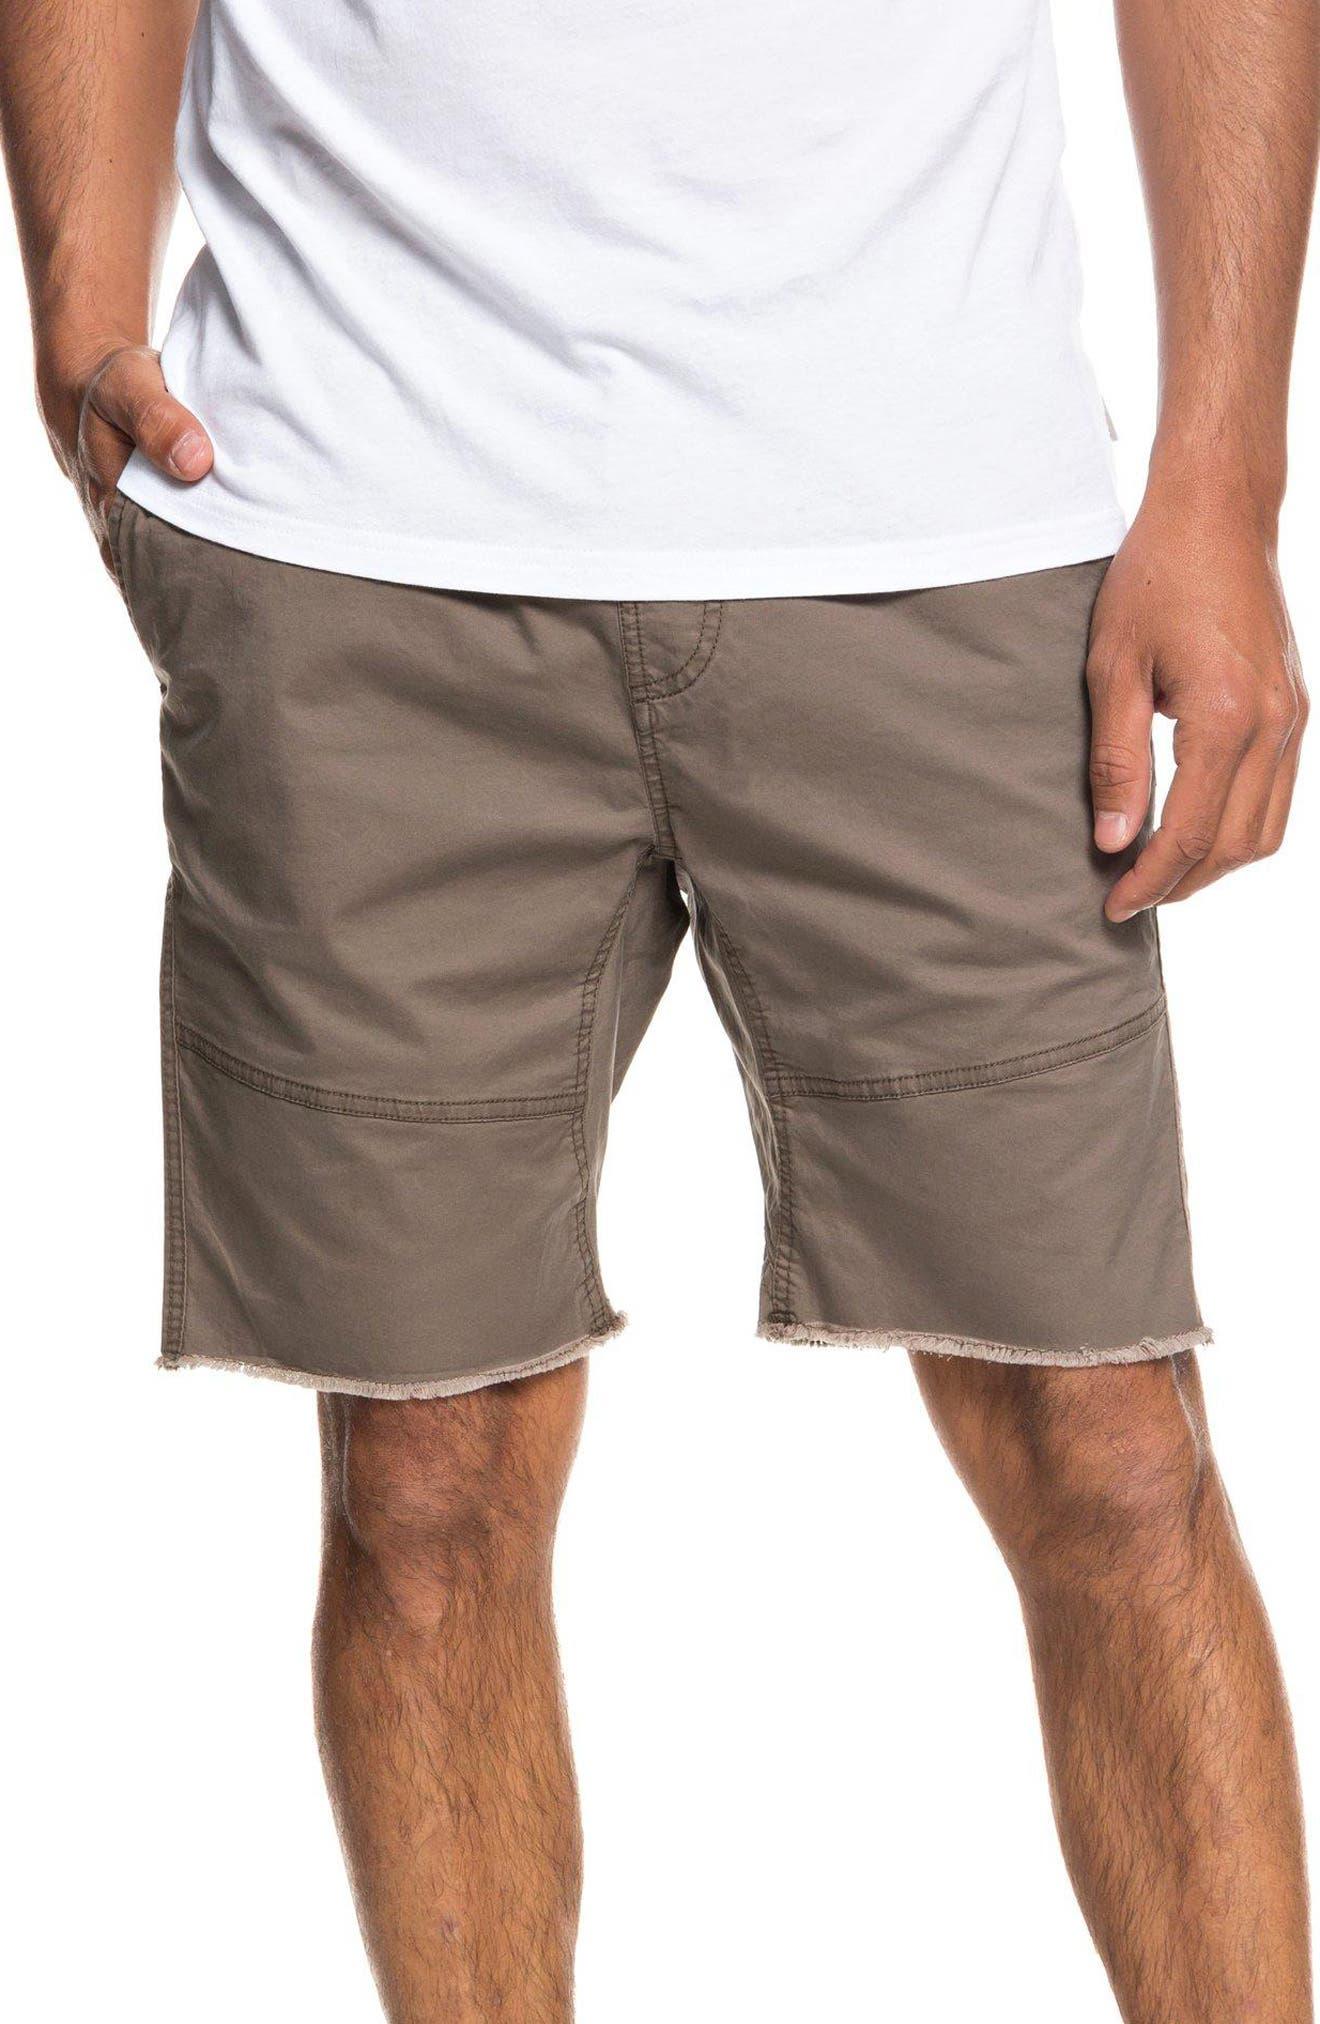 Foxoy Shorts,                             Main thumbnail 1, color,                             FALCON